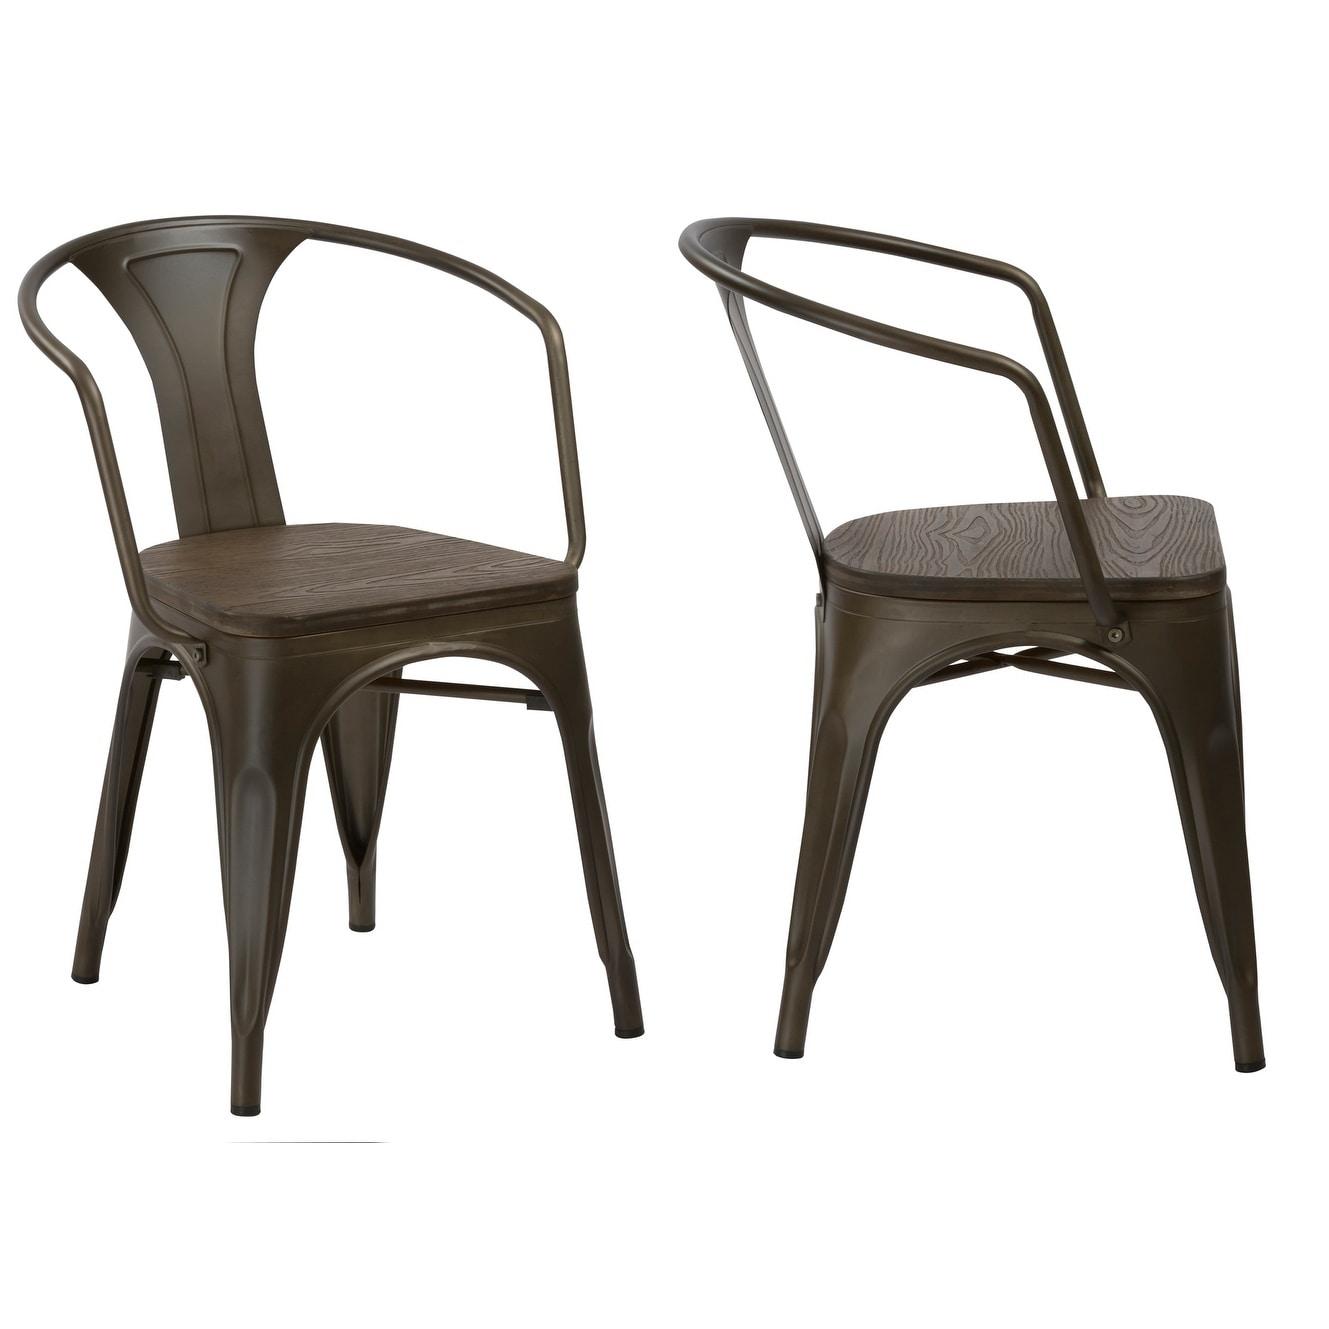 BTEXPERT 5060MCC-4 Distressed Dining Bistro Cafe Industrial Metal Antique Copper Bronze Indoor Outdoor Rustic Arm Chair